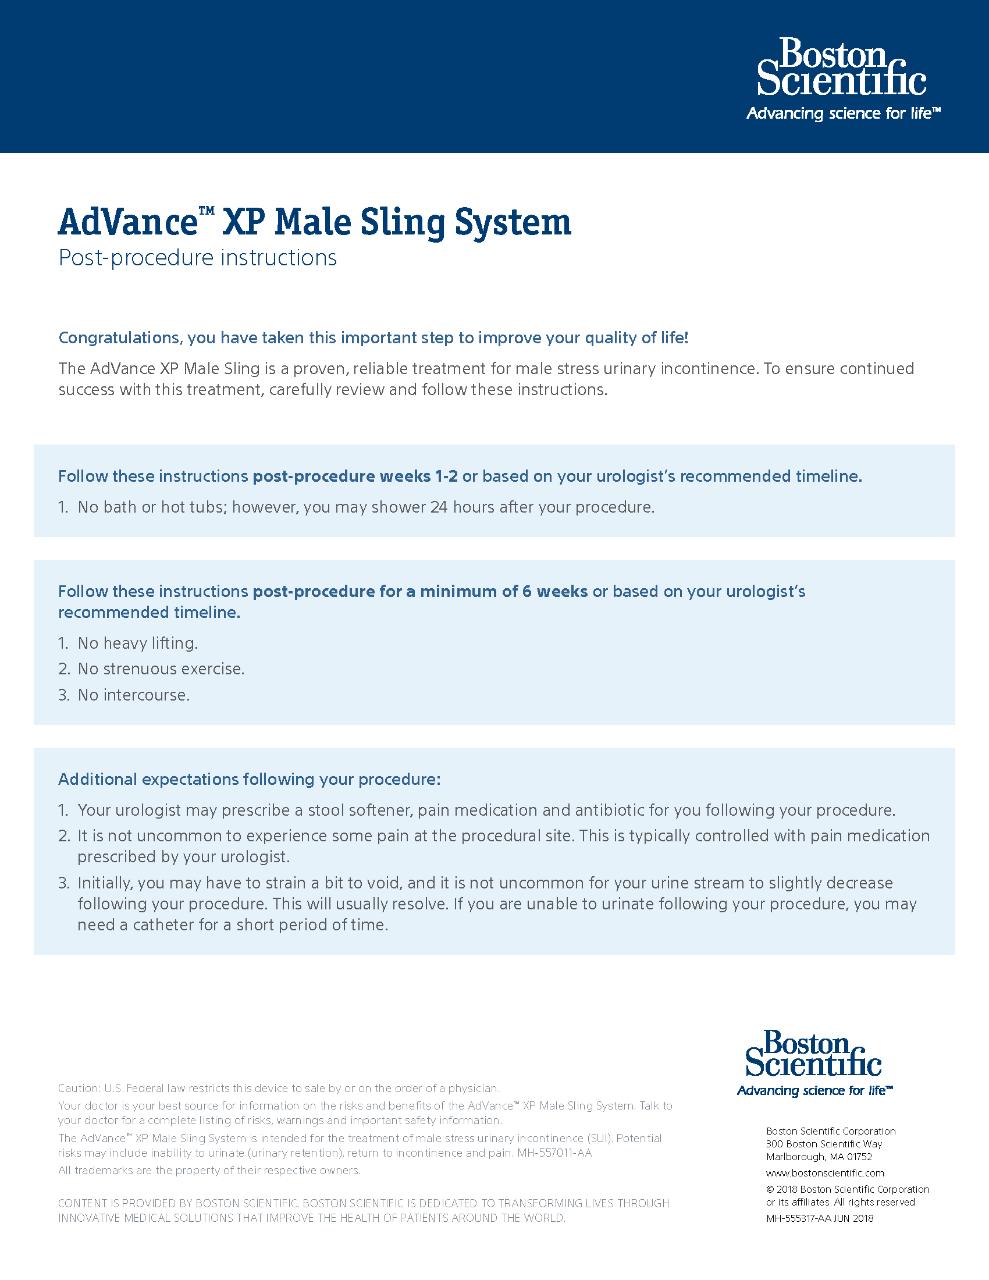 AdVance XP Post Procedure Instructions